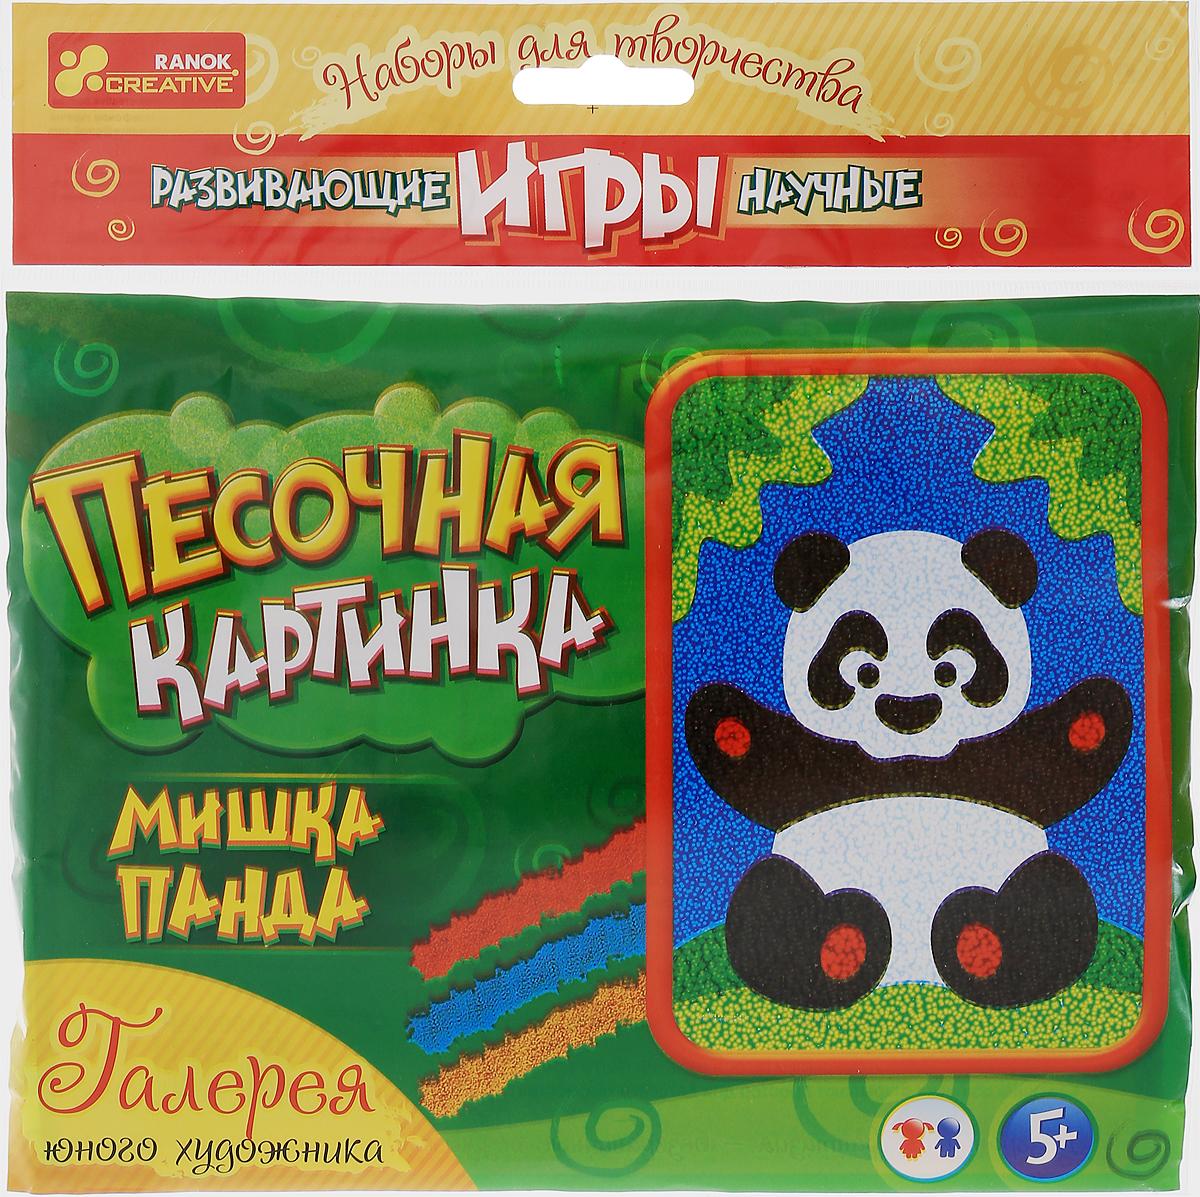 Ranok Набор для творчества Песочная картинка Мишка панда цена